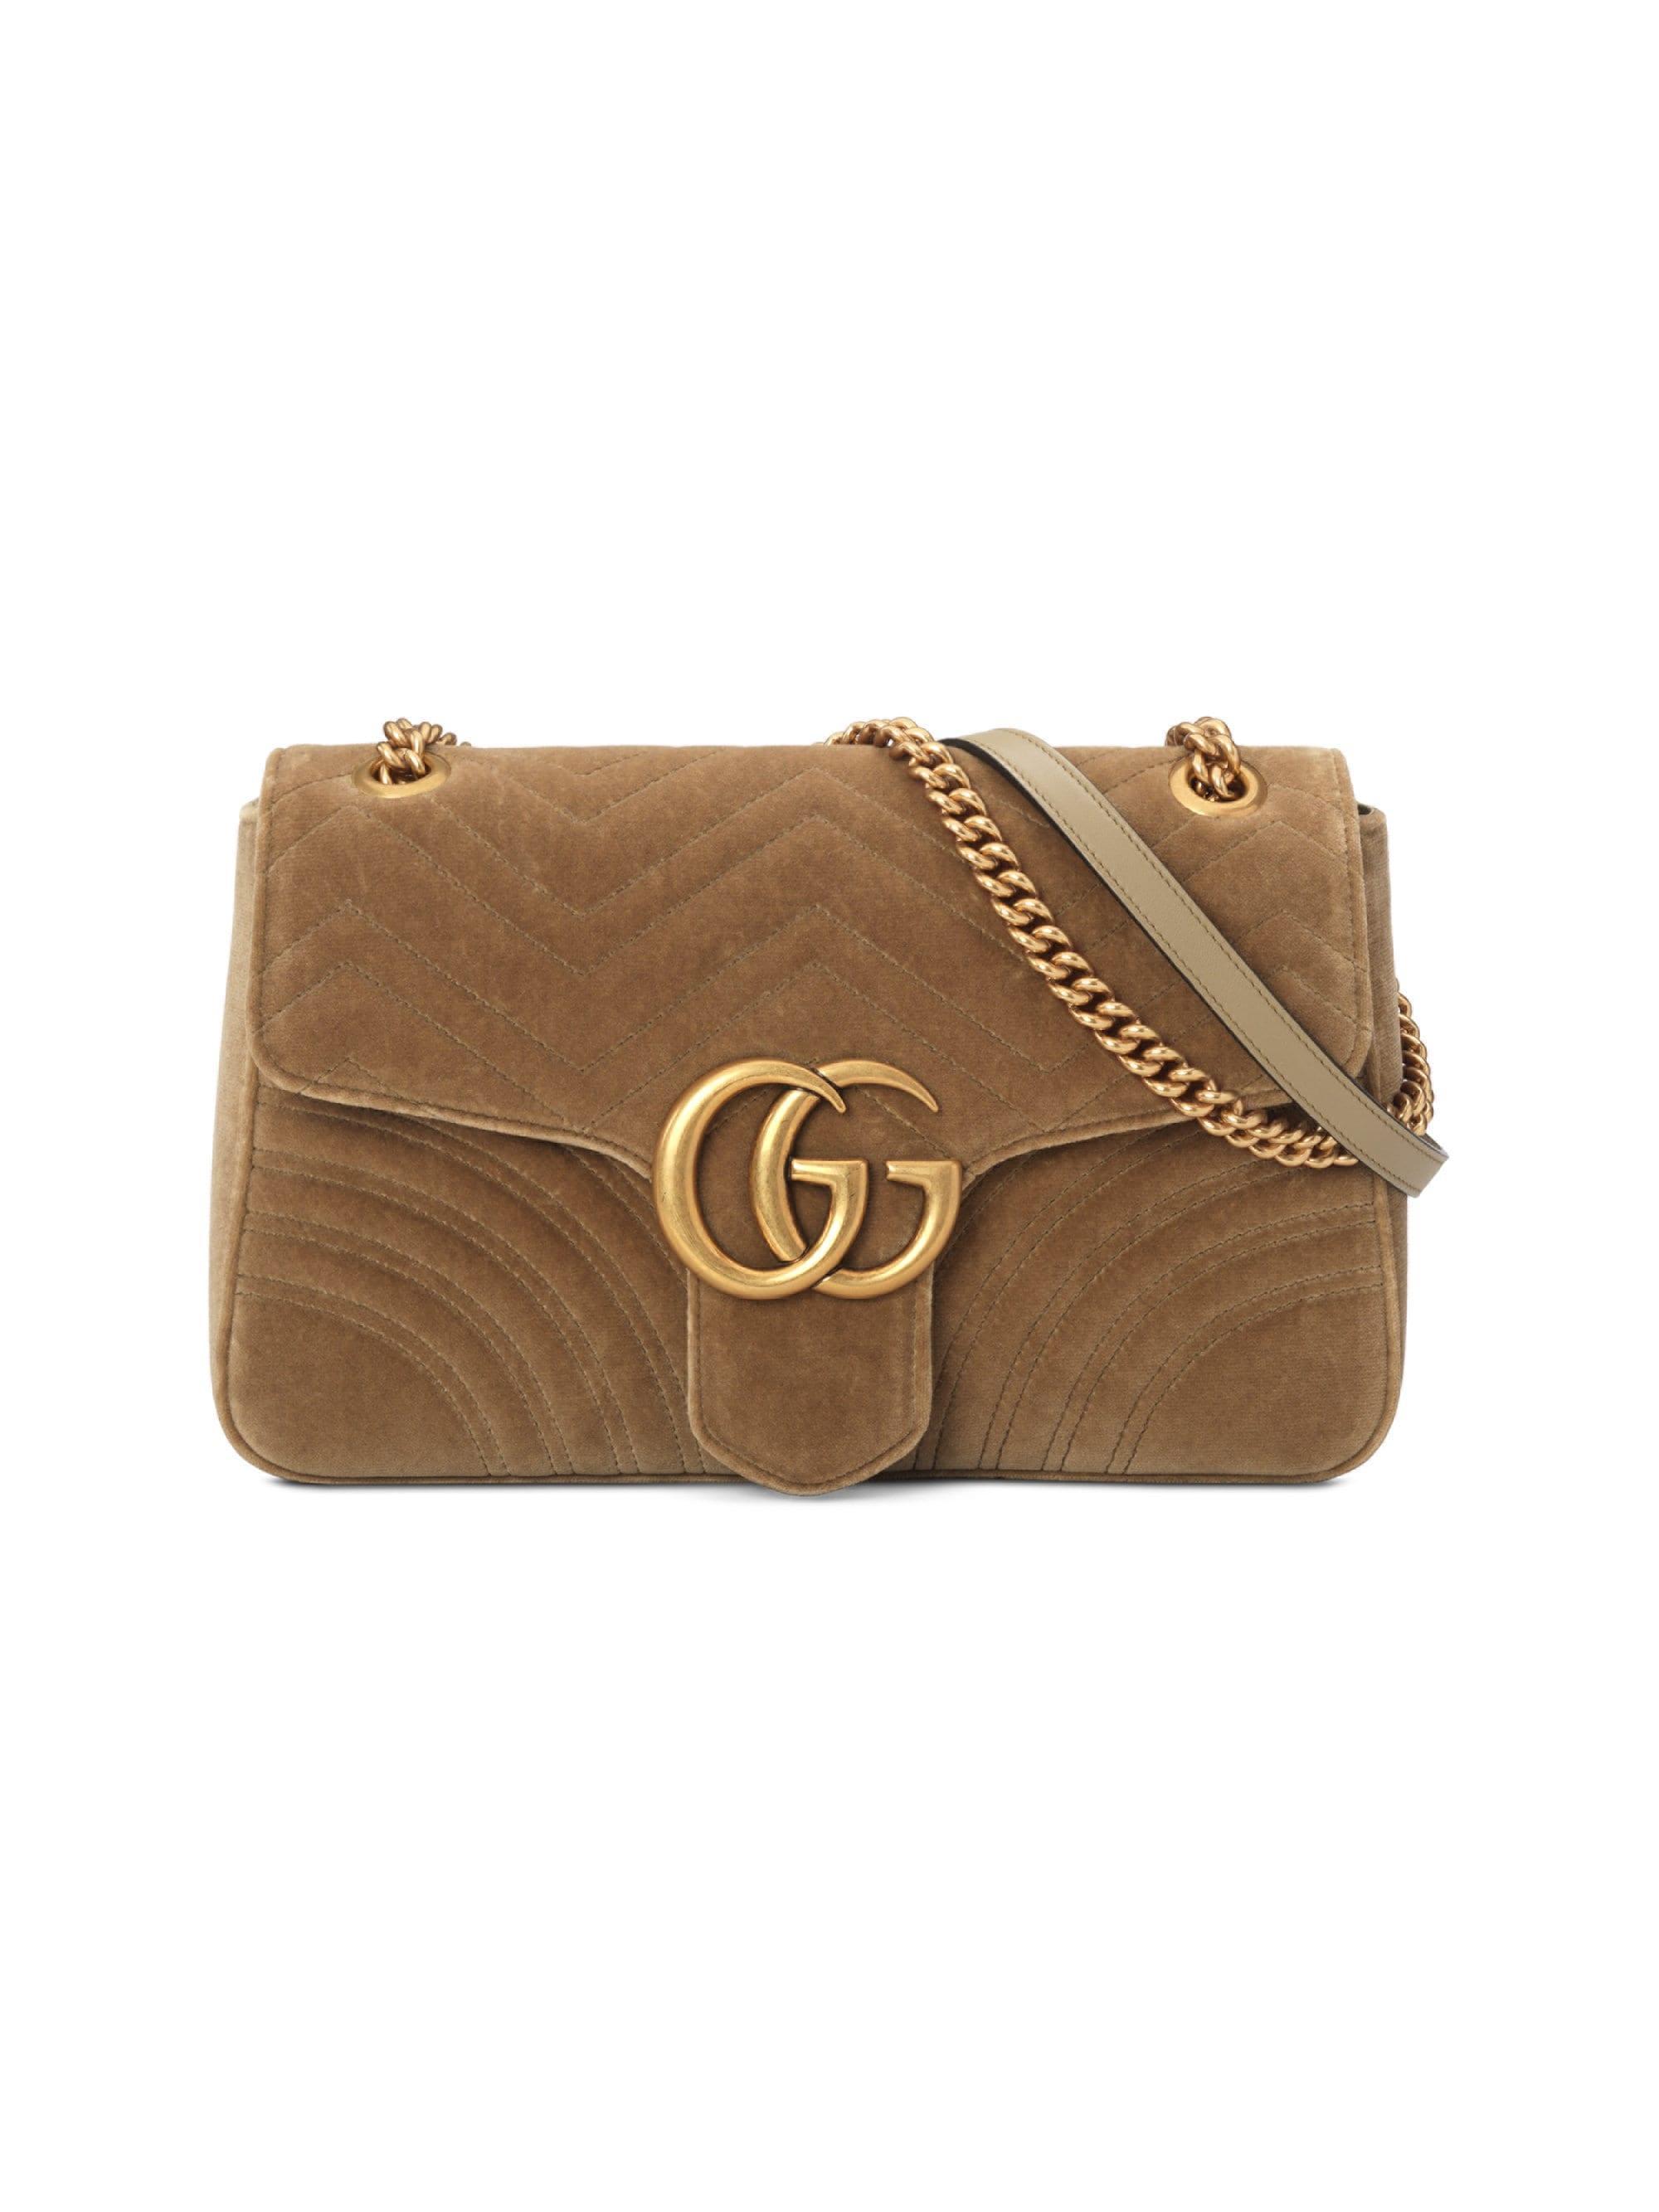 4532daa5d58 Gucci. Women s GG Marmont Velvet Medium Shoulder Bag